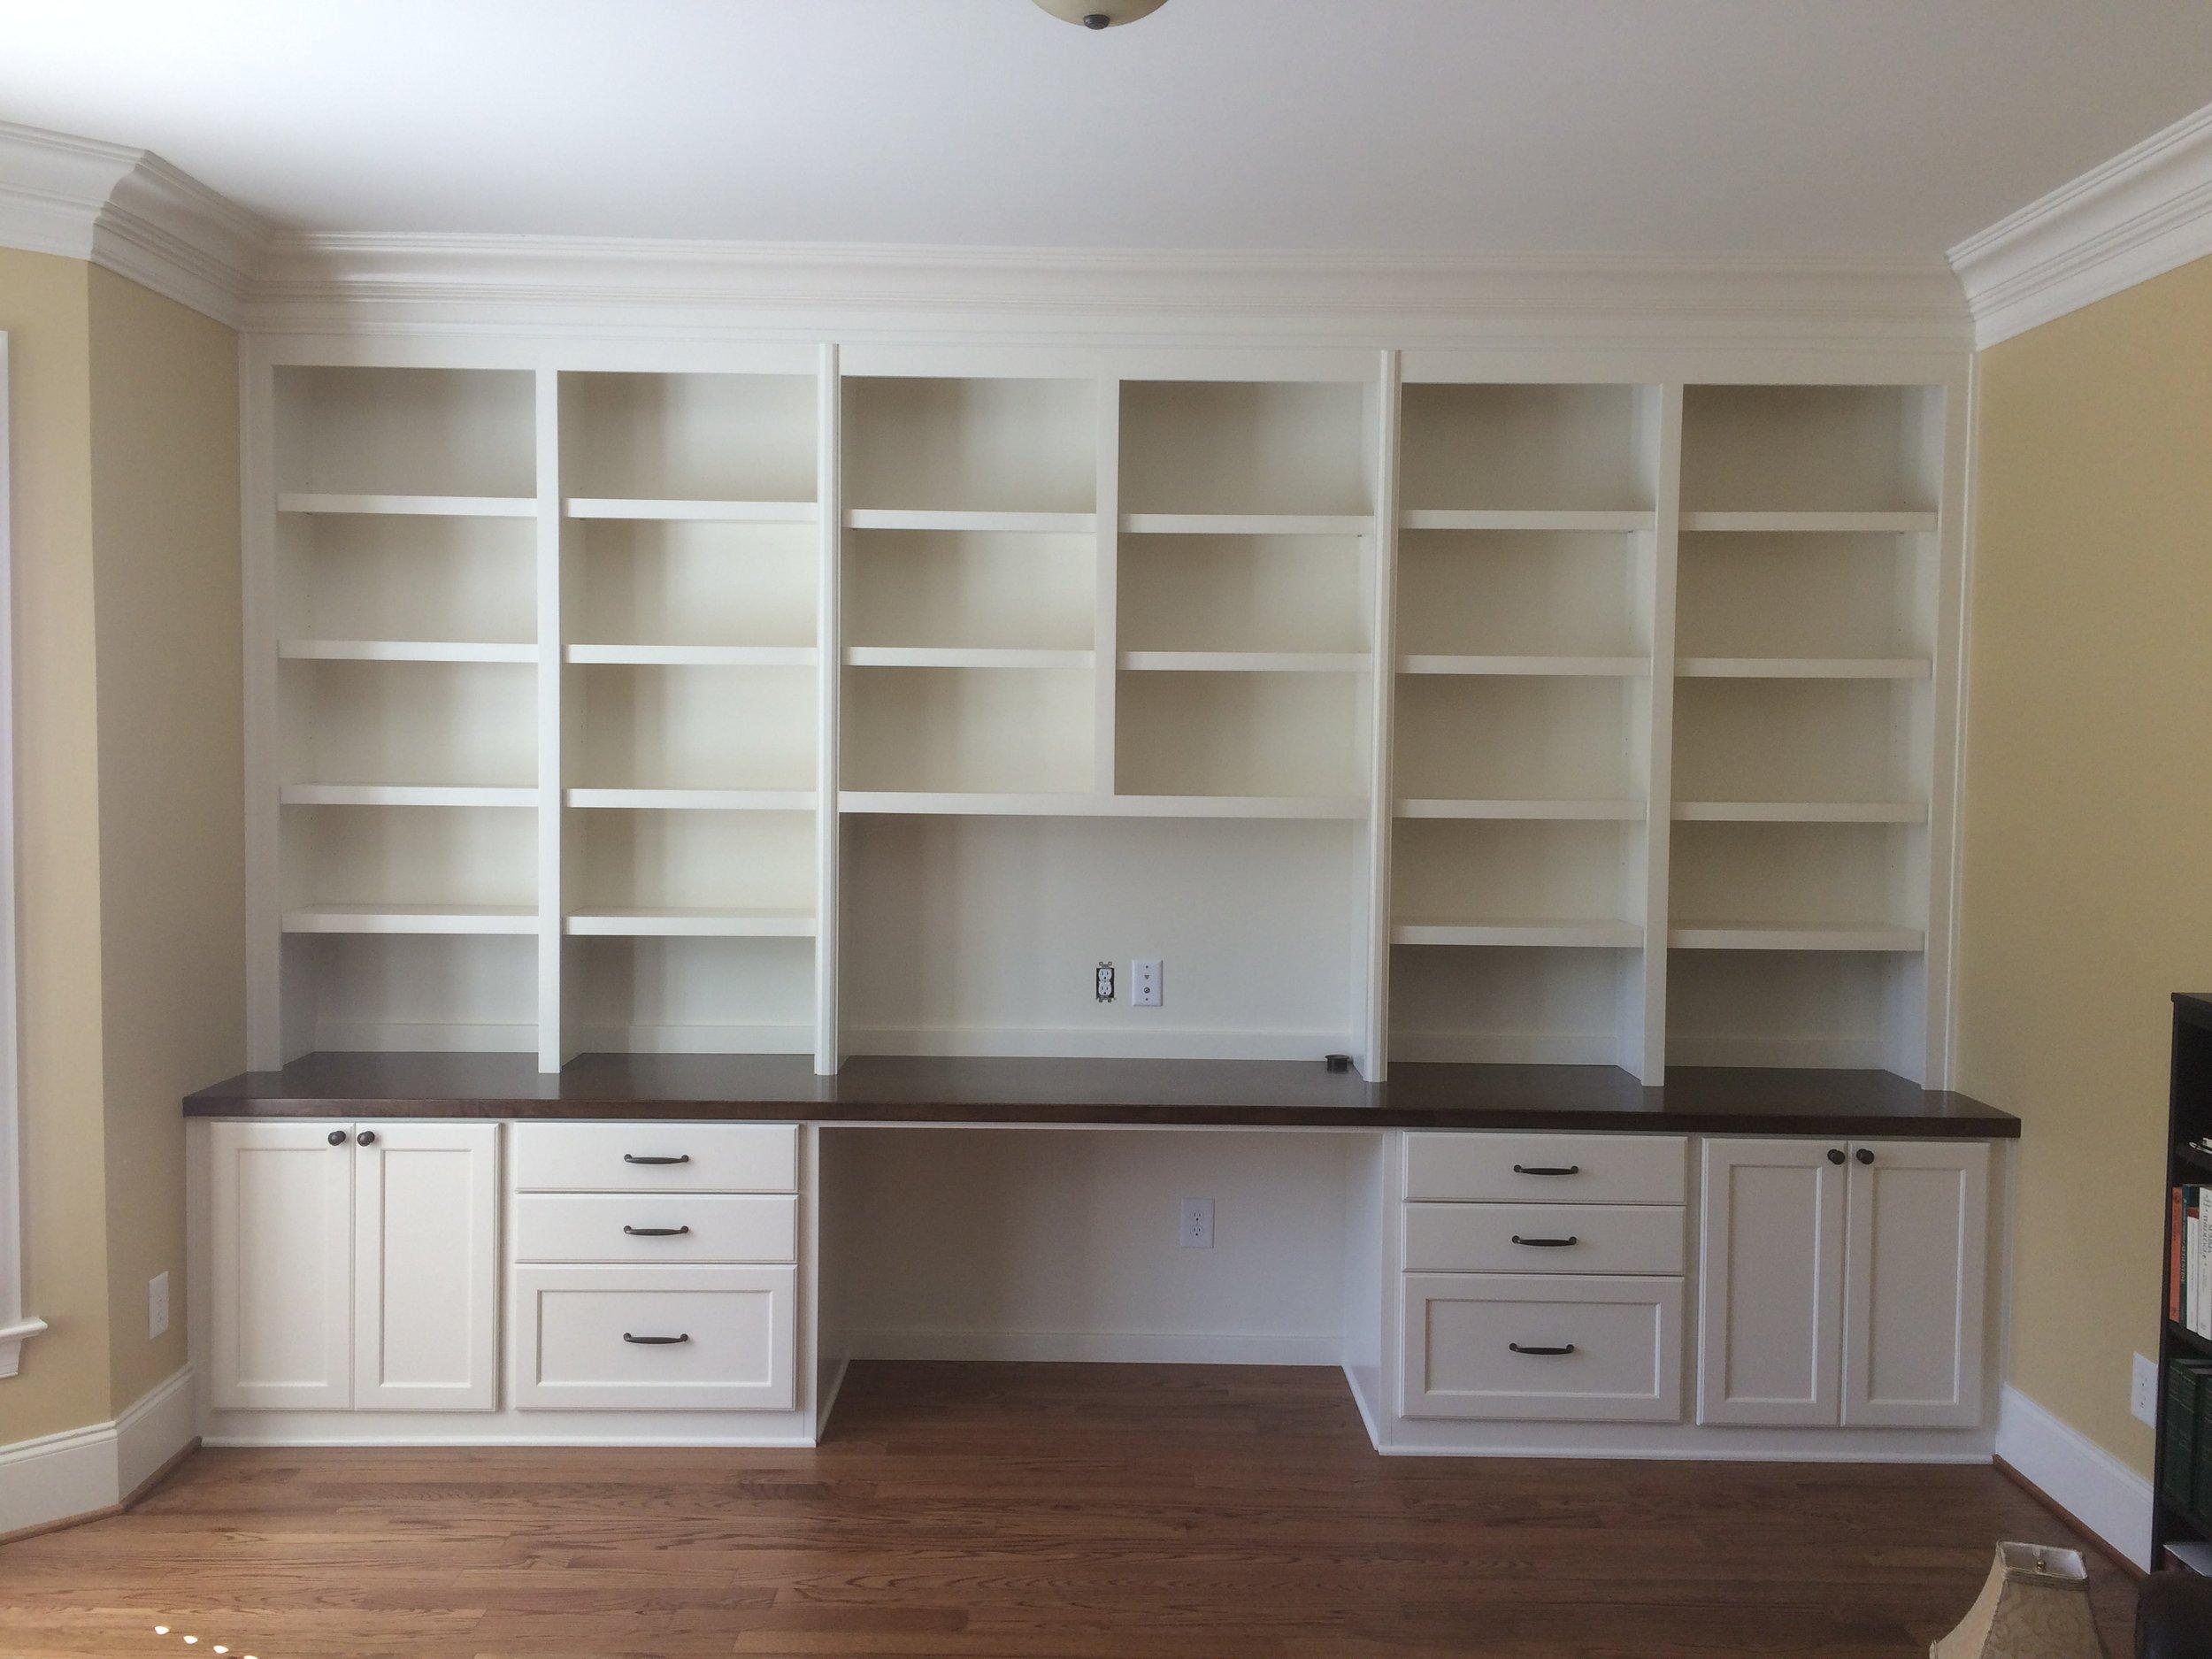 Custom Desk with Shaker Doors & Filing Drawers, Slab Drawers, Stain Maple Countertop & Adjustable Shelves